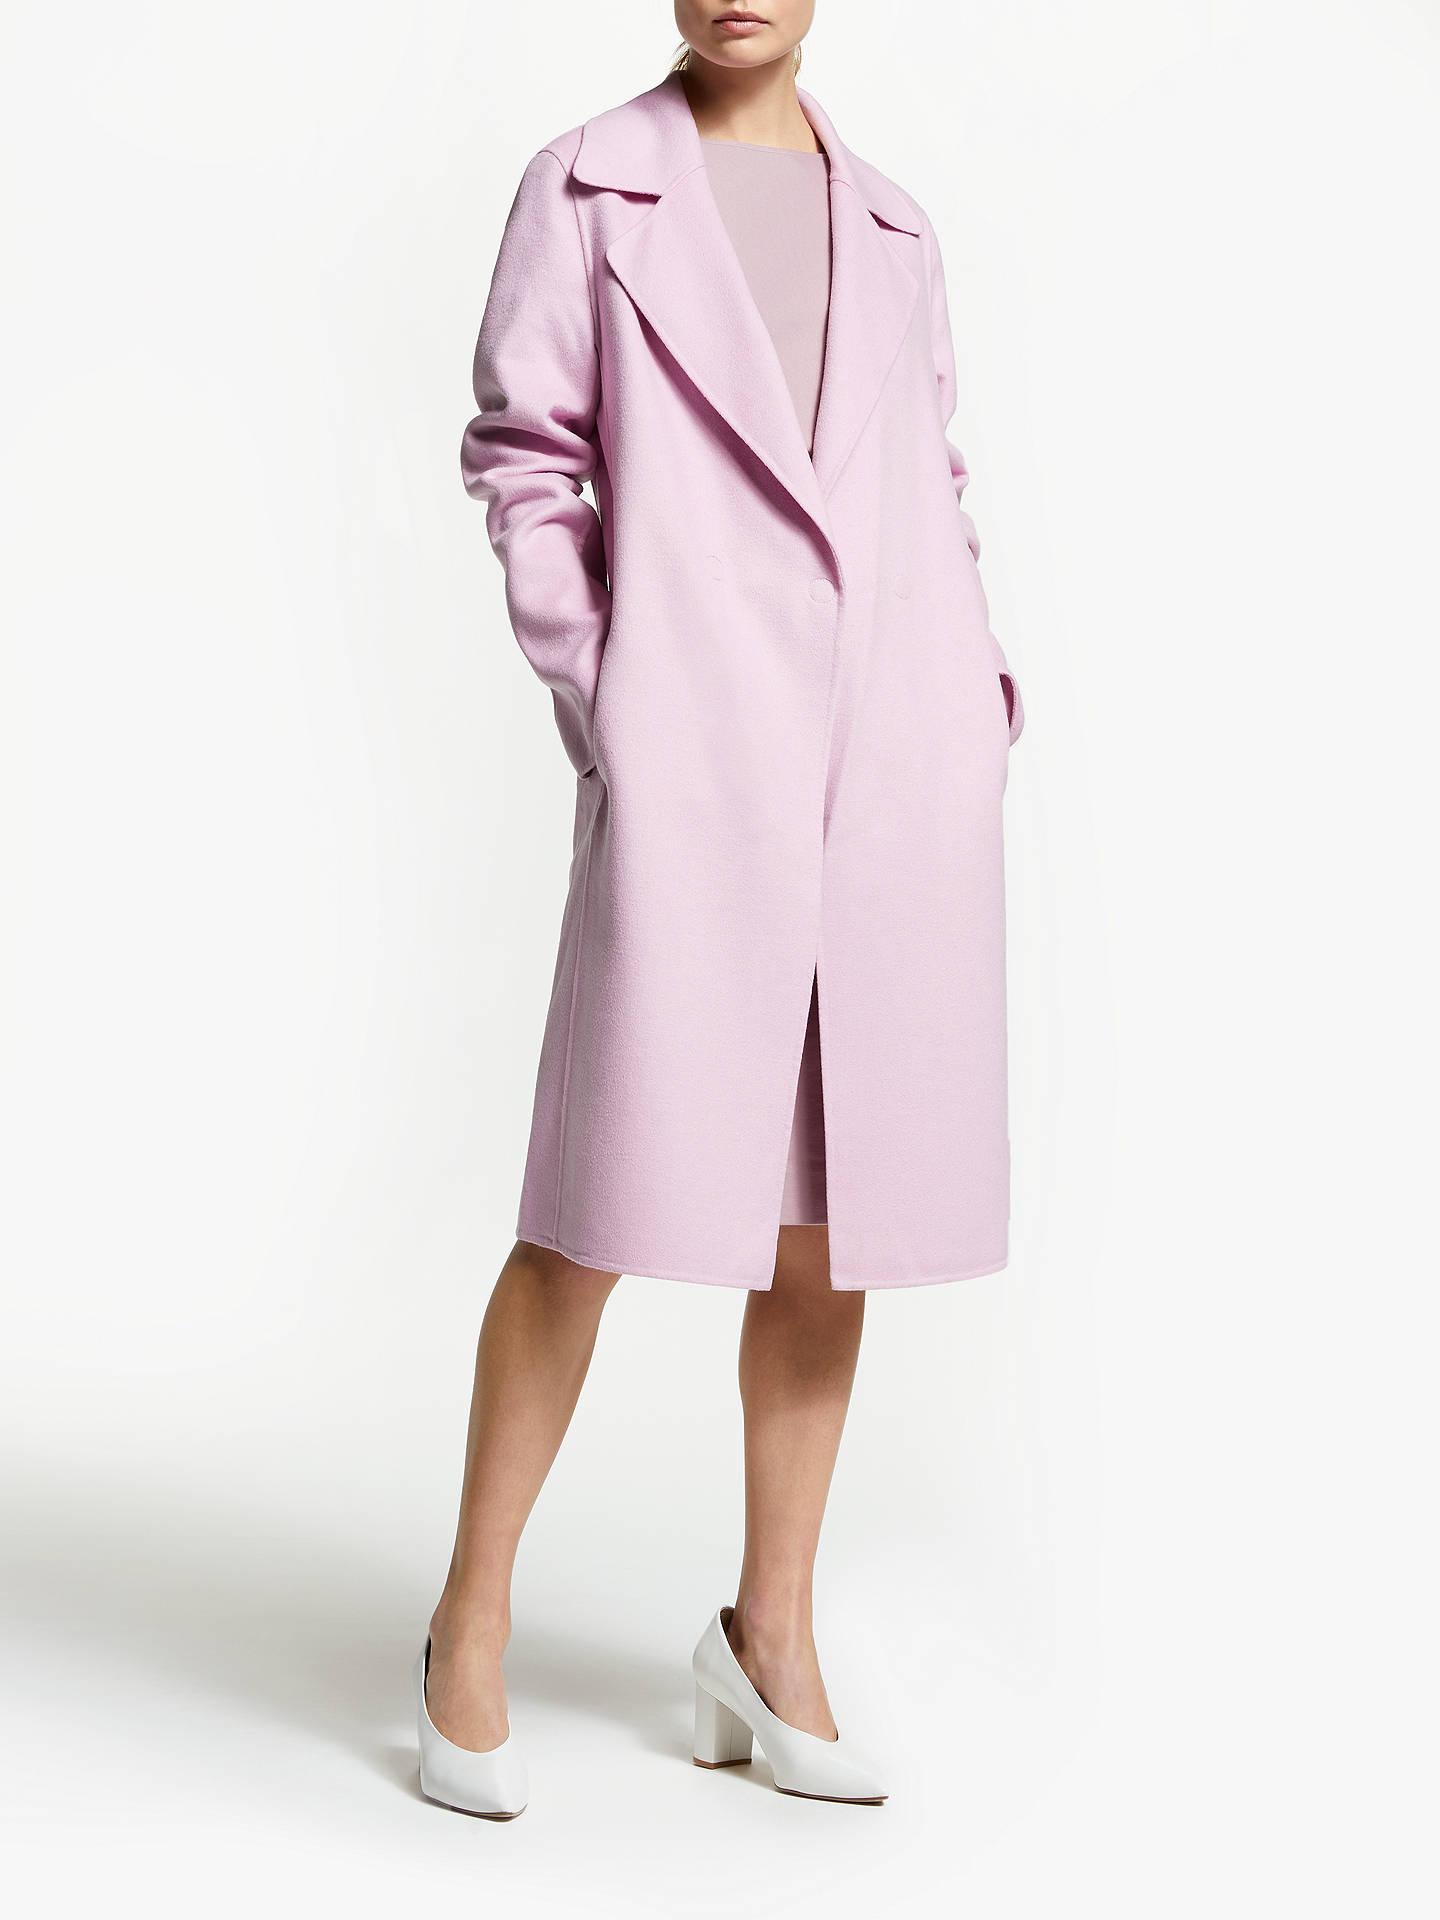 74079ee86a Winser London Lauren Wool Blend Coat, Lavender Pink